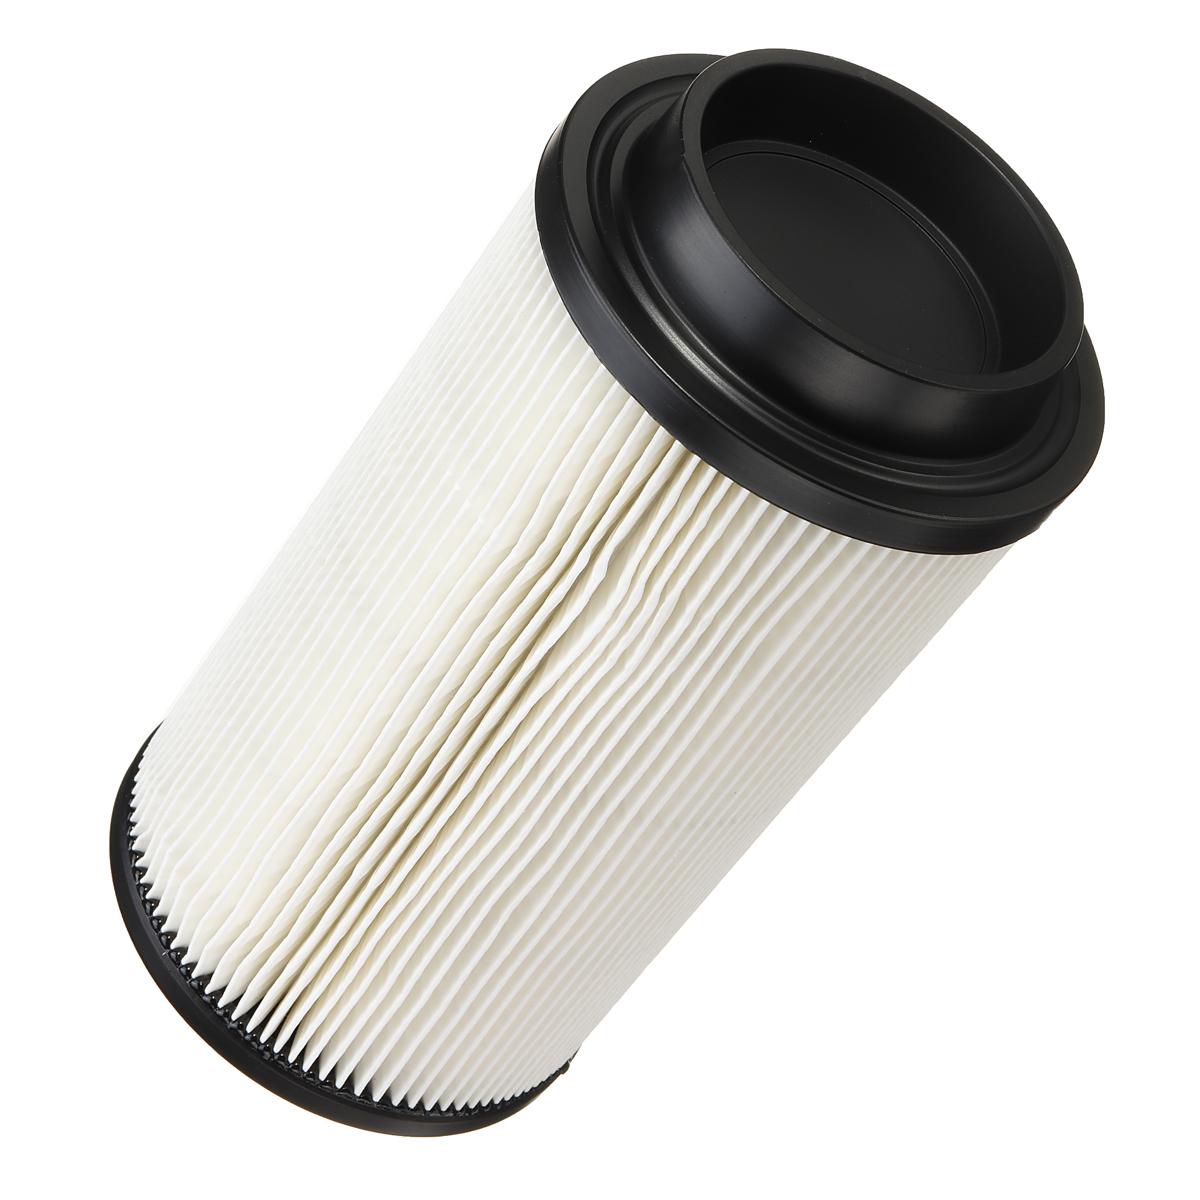 fengqing Filtro de Aire # 7080595 Filtro de Aire for Polaris Sportsman Scrambler 400 500 600 700 800 550 850 F/ácil instalaci/ón